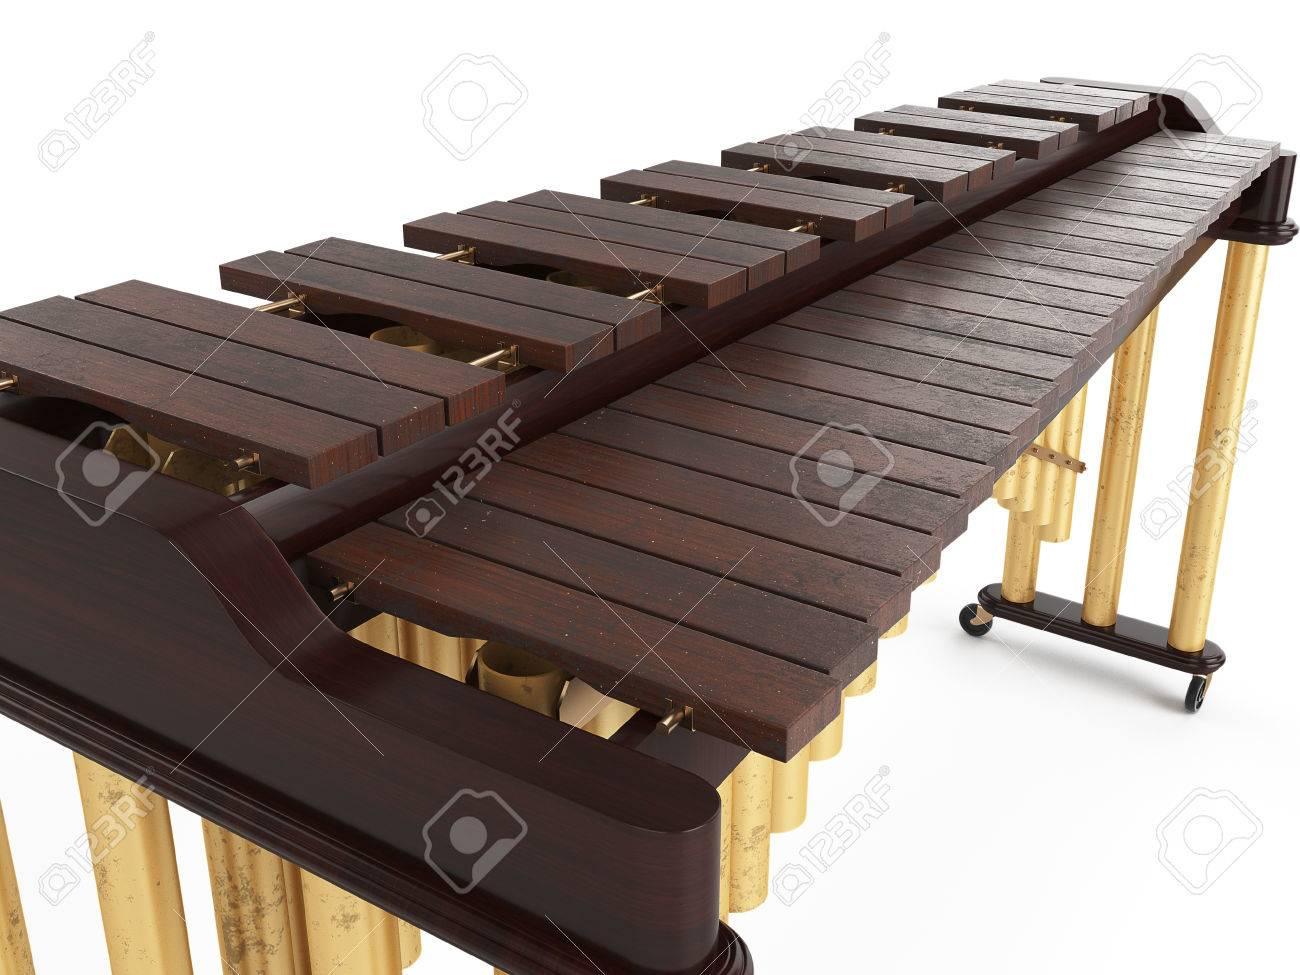 Marimba isolated on white background 3d rendering Standard-Bild - 58930726